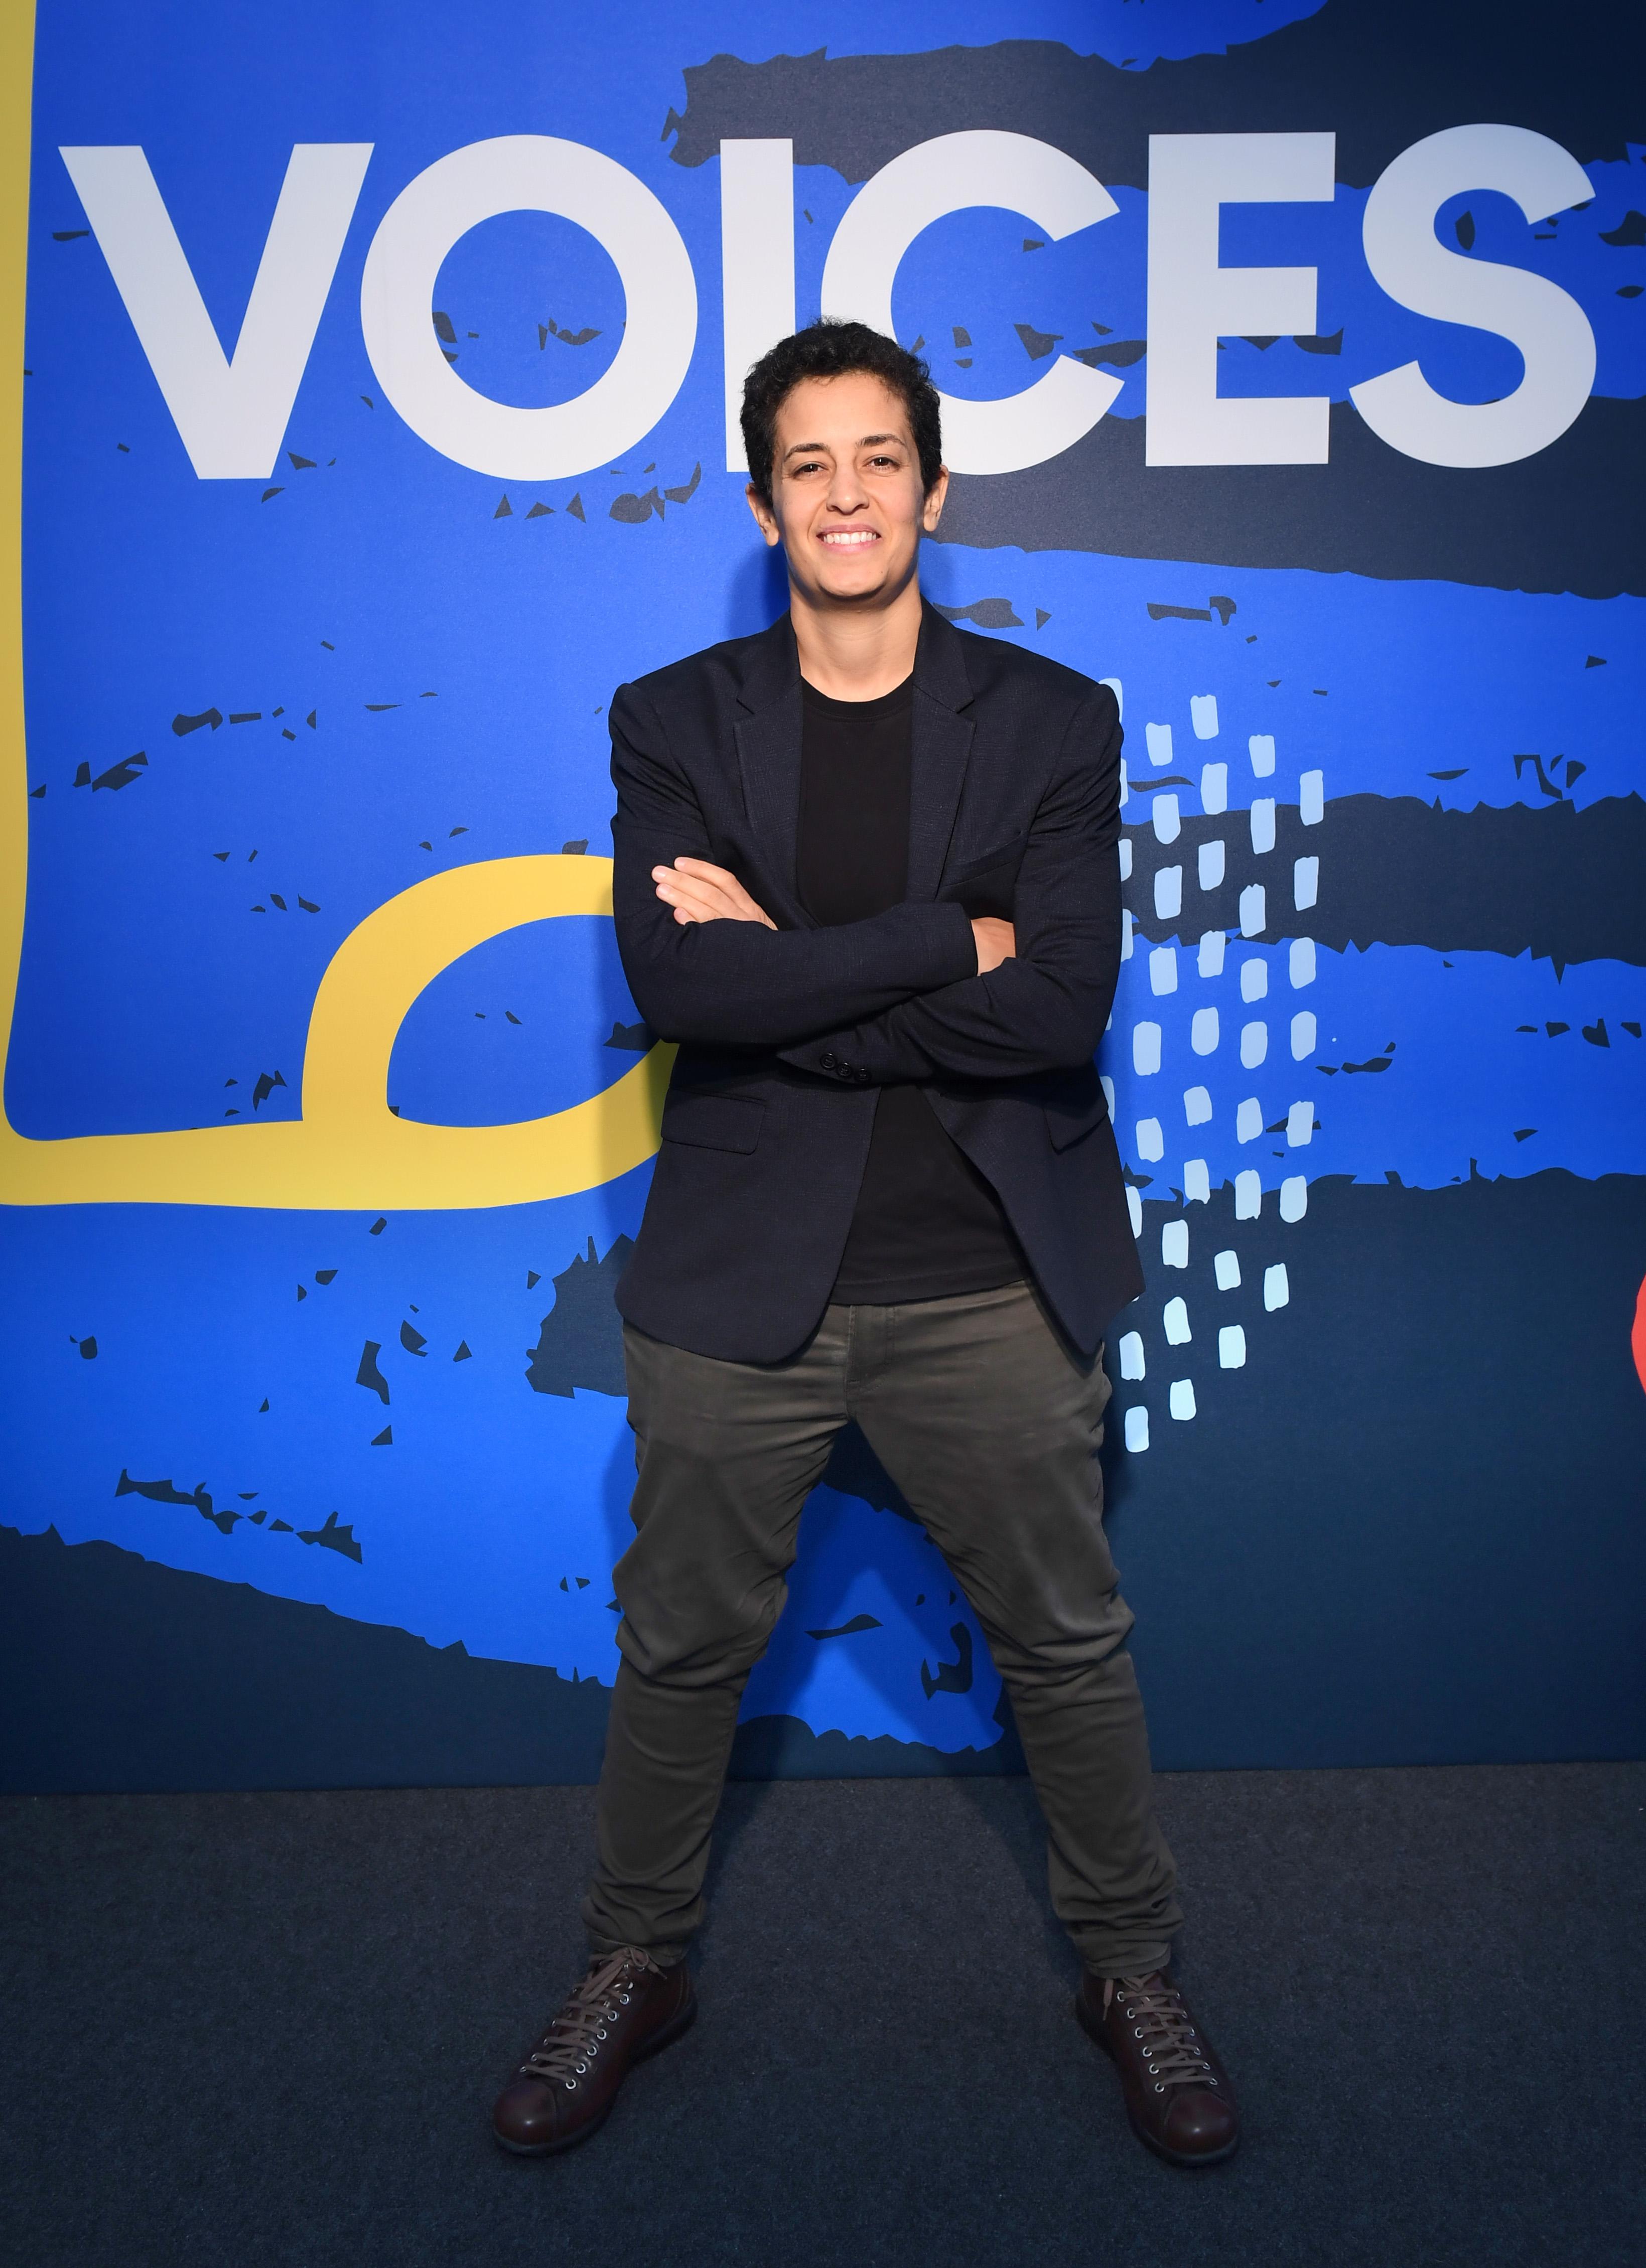 BoF VOICES 2019 - Lina Khalifeh - 27